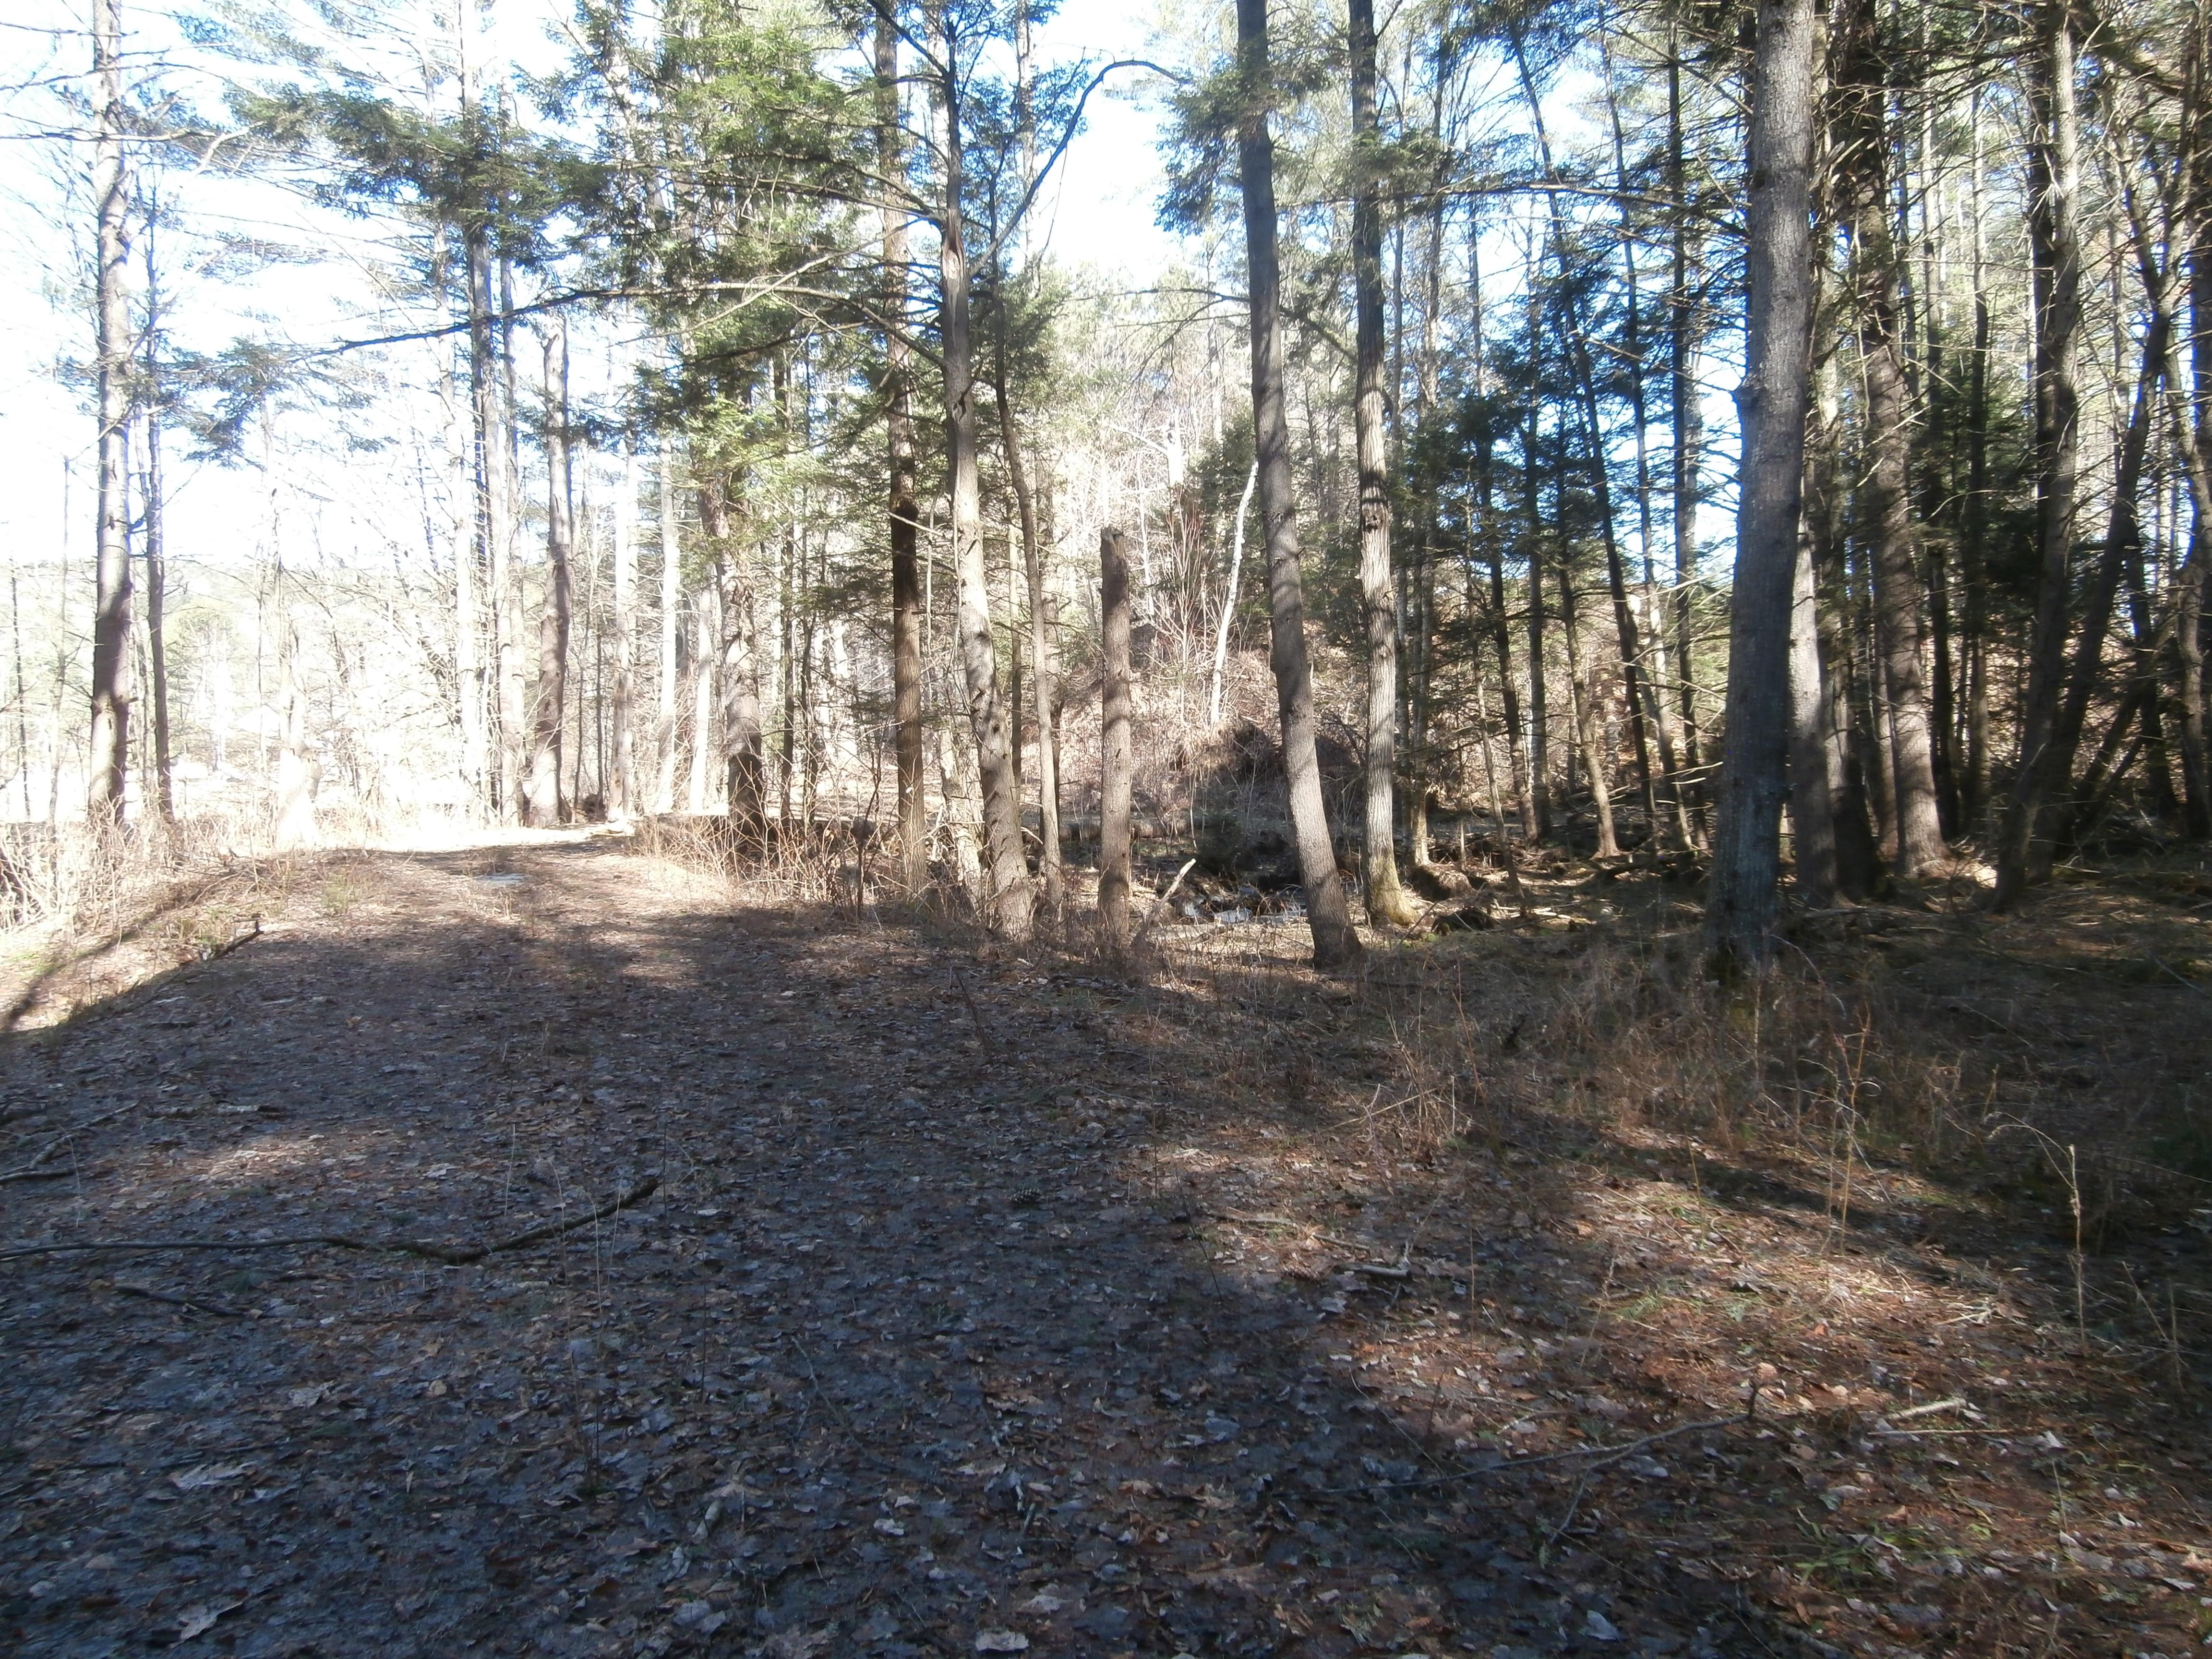 Terreno para Venda às 00-47B Nh Route 10, Orford Orford, New Hampshire 03777 Estados Unidos